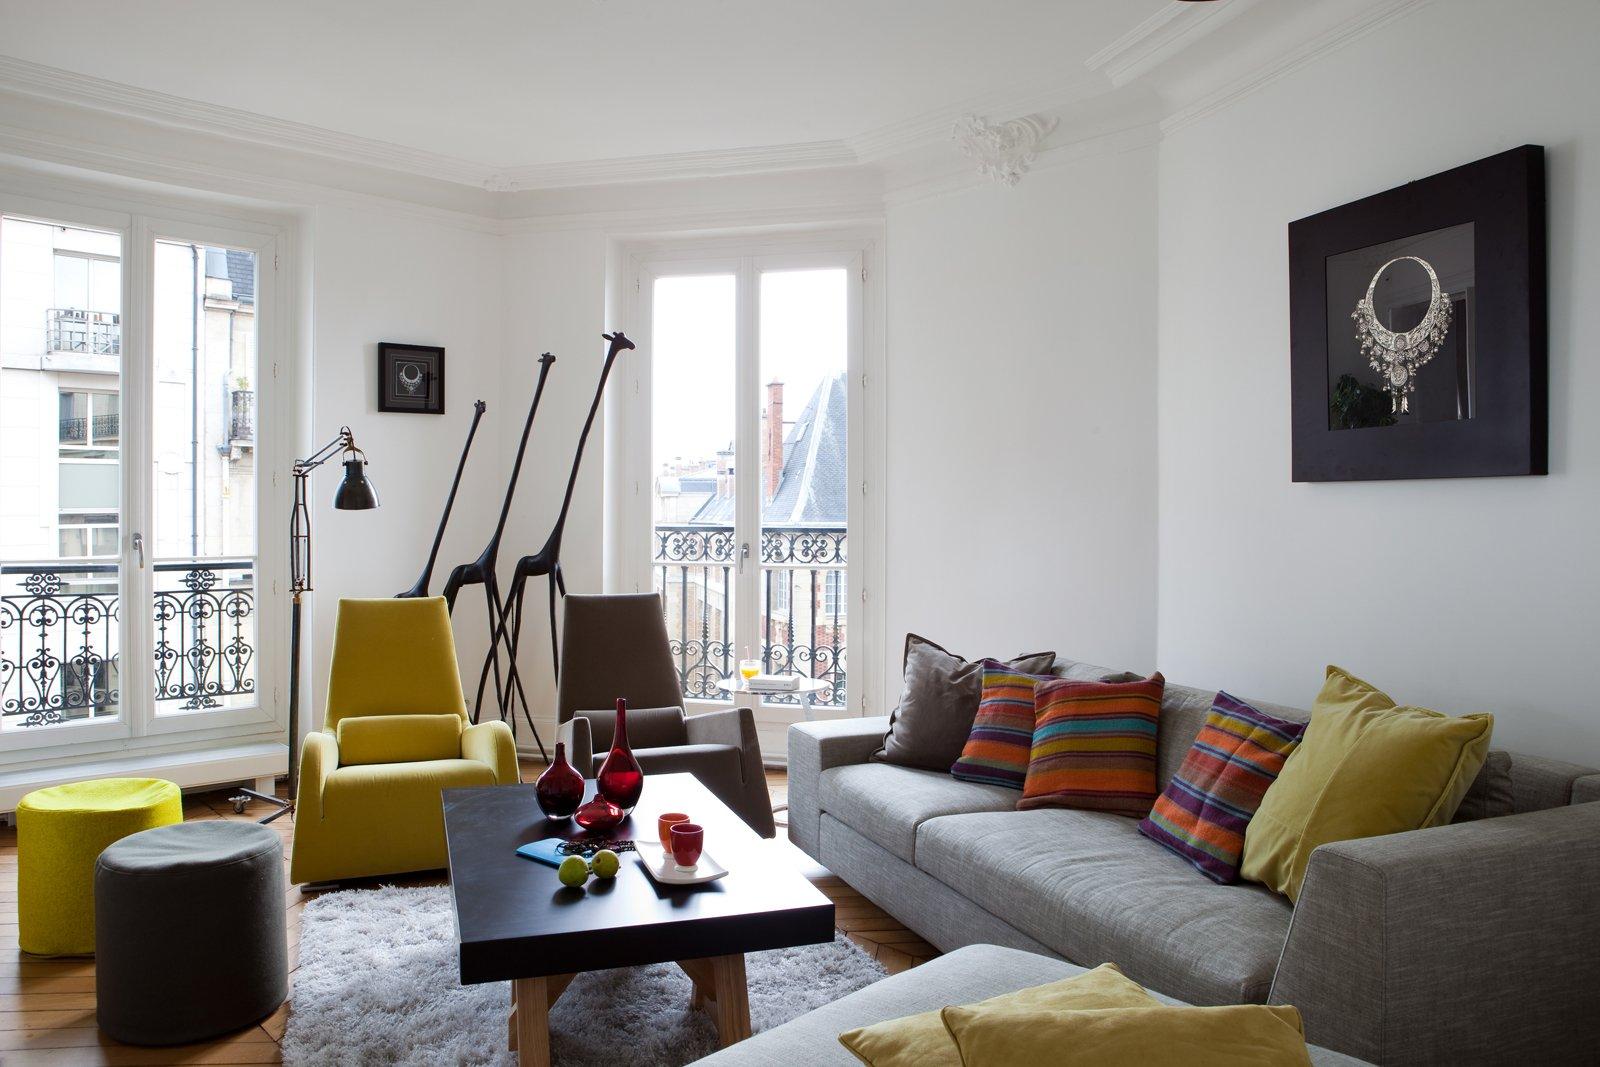 In edicola cose di casa cose di casa for Moderni minuscoli kit di case